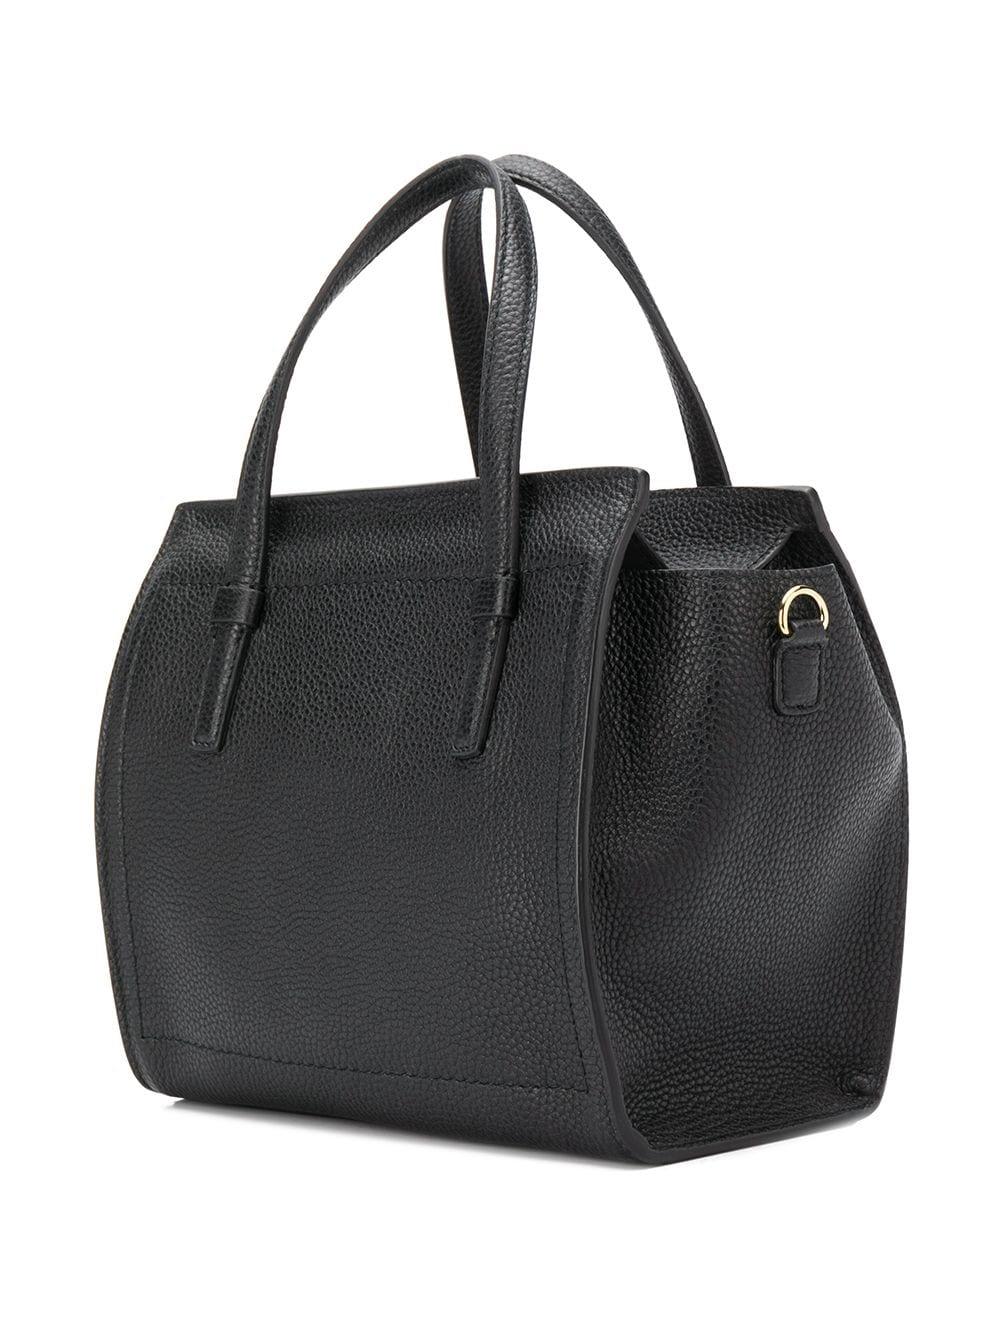 Picture of Ferragamo   Double Handle Tote Bag